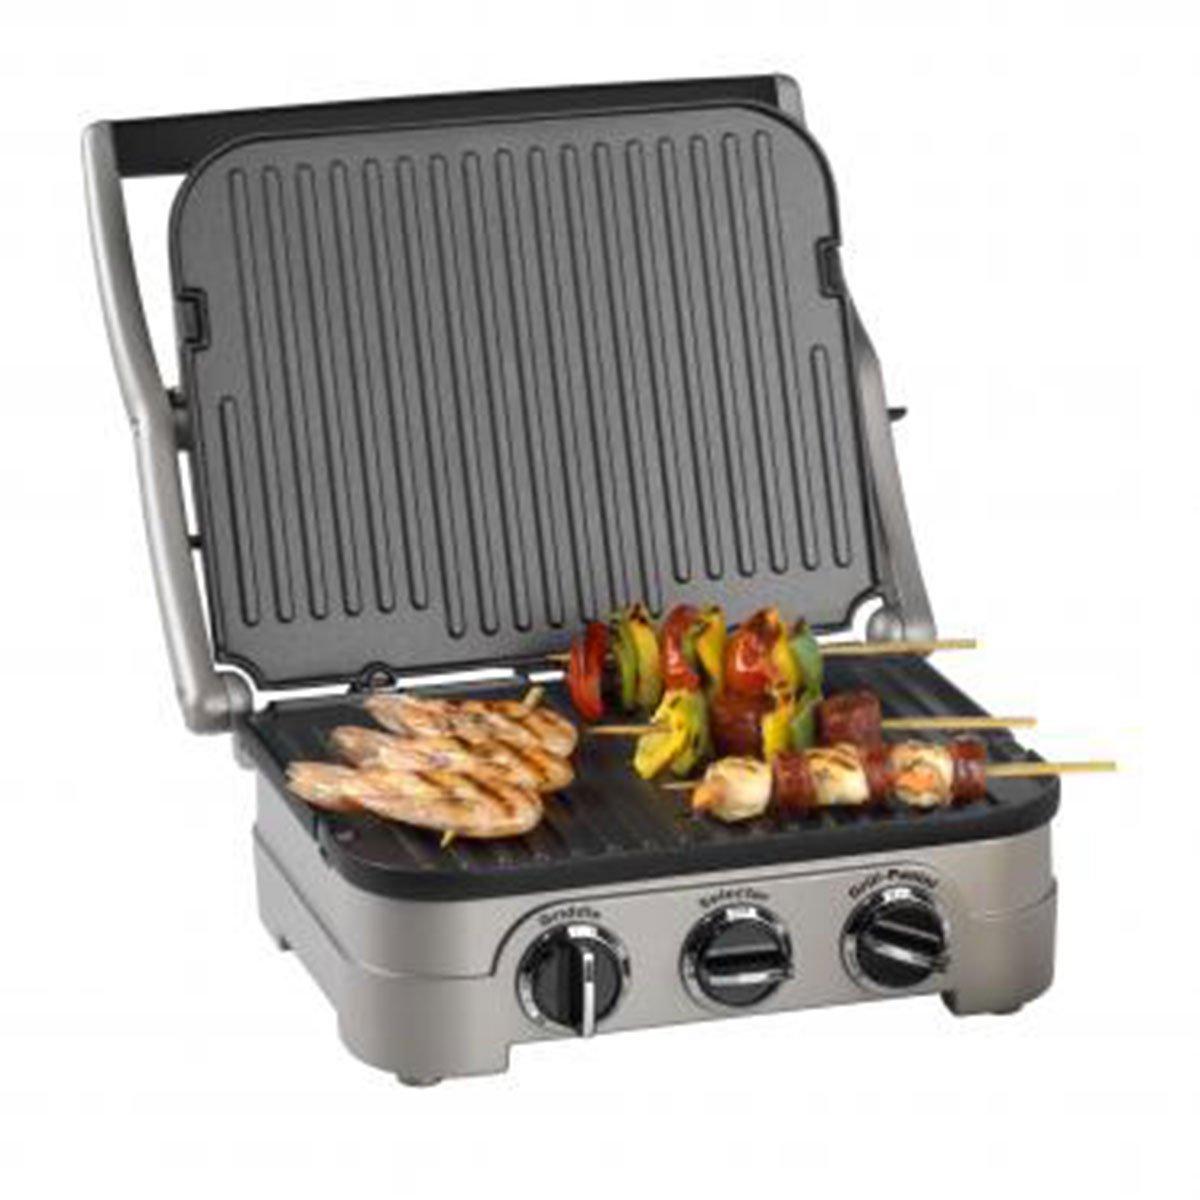 Cuisinart Multifunktions-Grill mit Kochplatte GR4CU